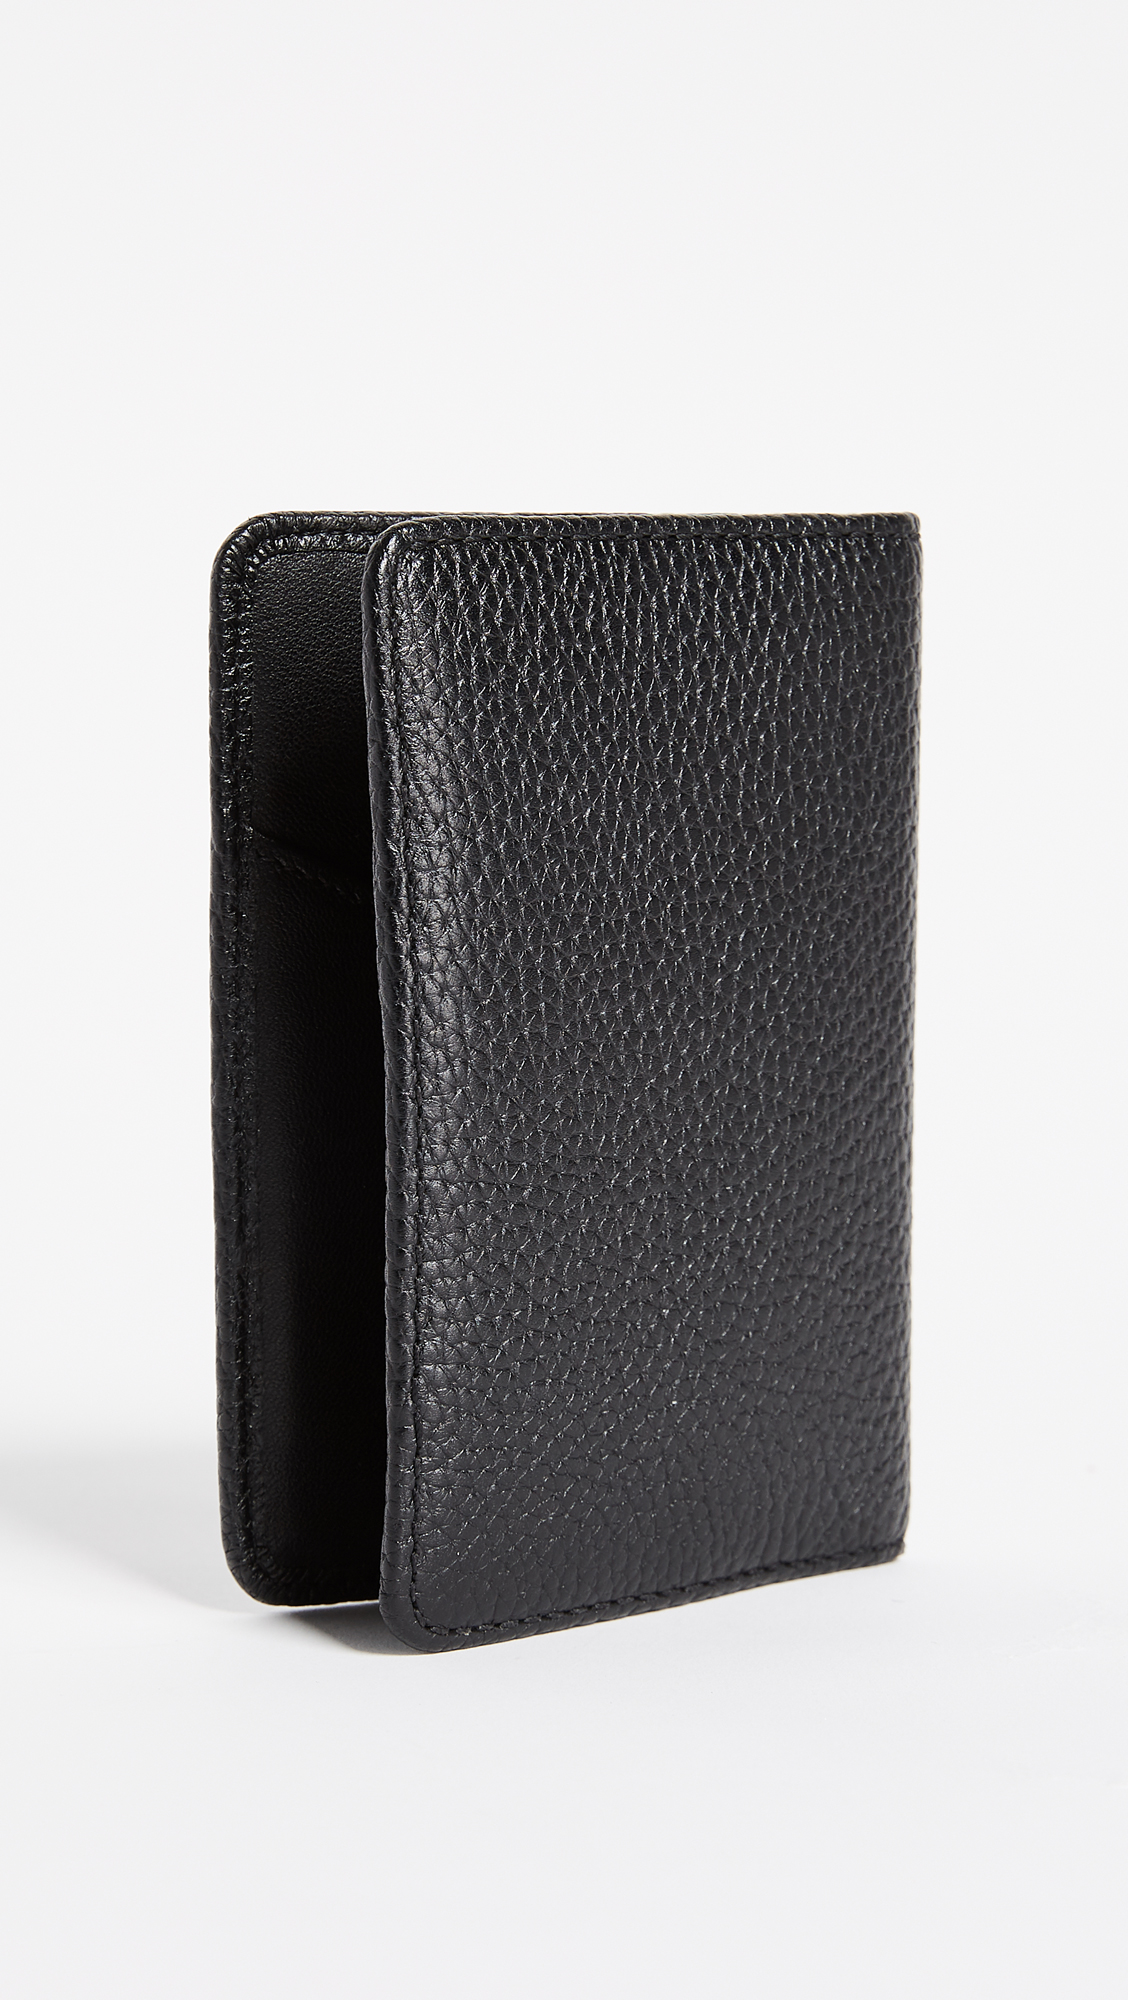 e6a13ea0e7fa Marc Jacobs Gotham Passport Cover